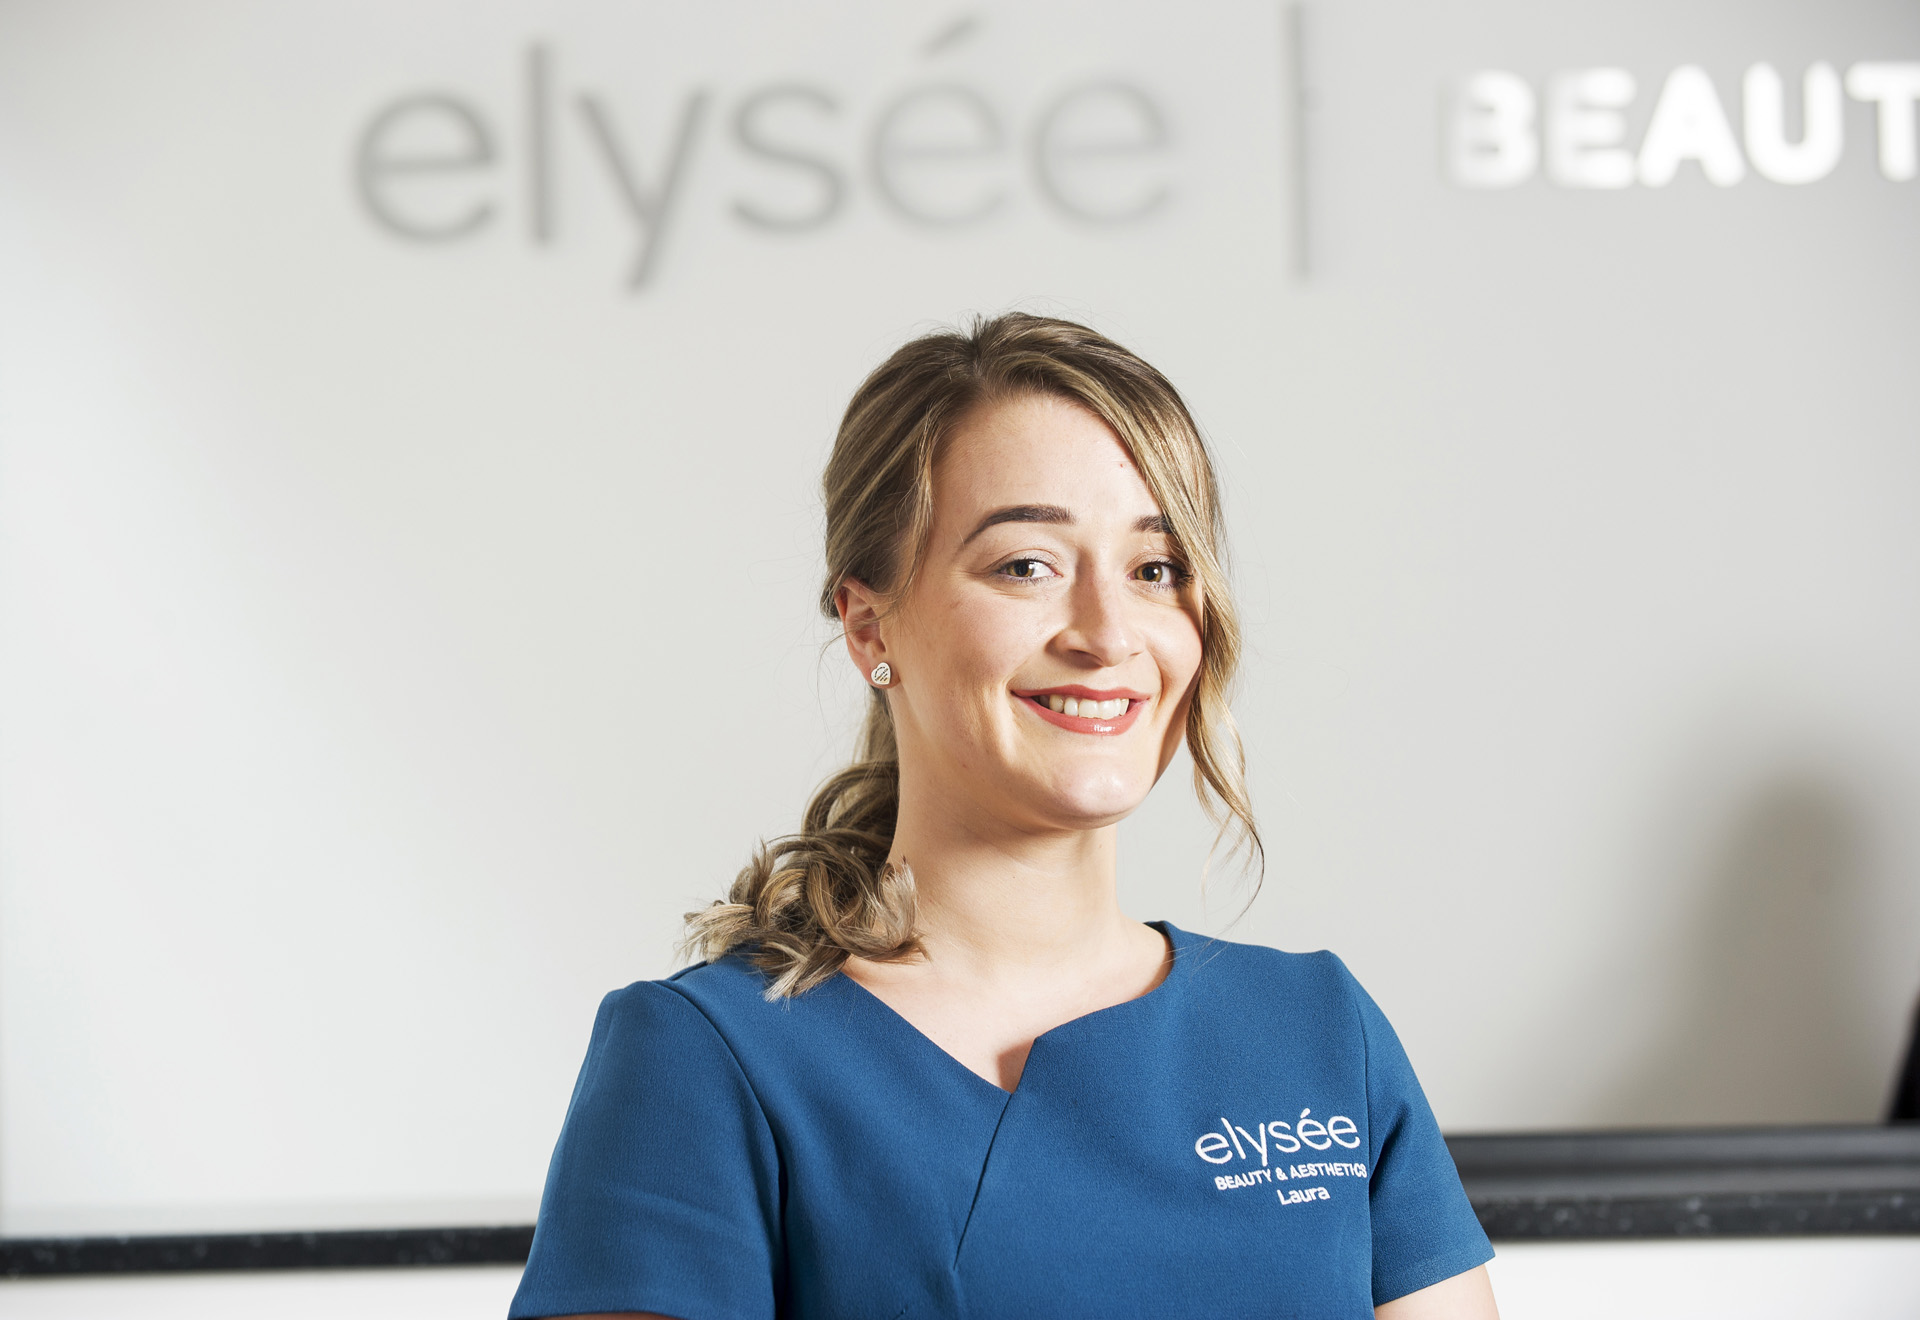 LAURA - SALON ELYSEE BEAUTY & AESTHETICS